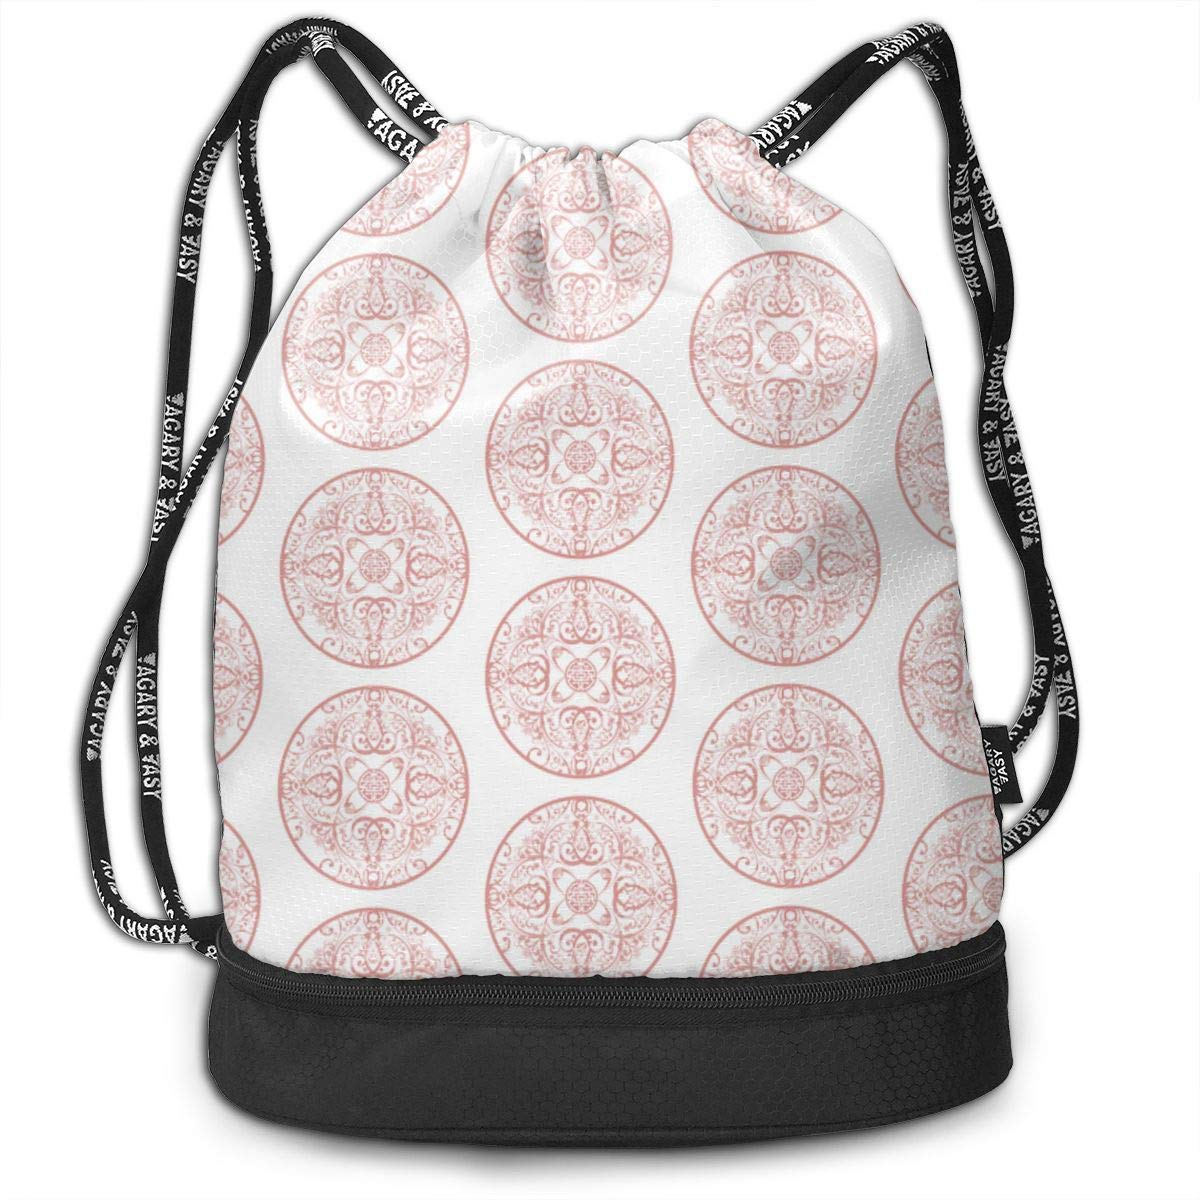 Sprudla Dot Multi Pink Drawstring Backpack Sports Athletic Gym Cinch Sack String Storage Bags for Hiking Travel Beach